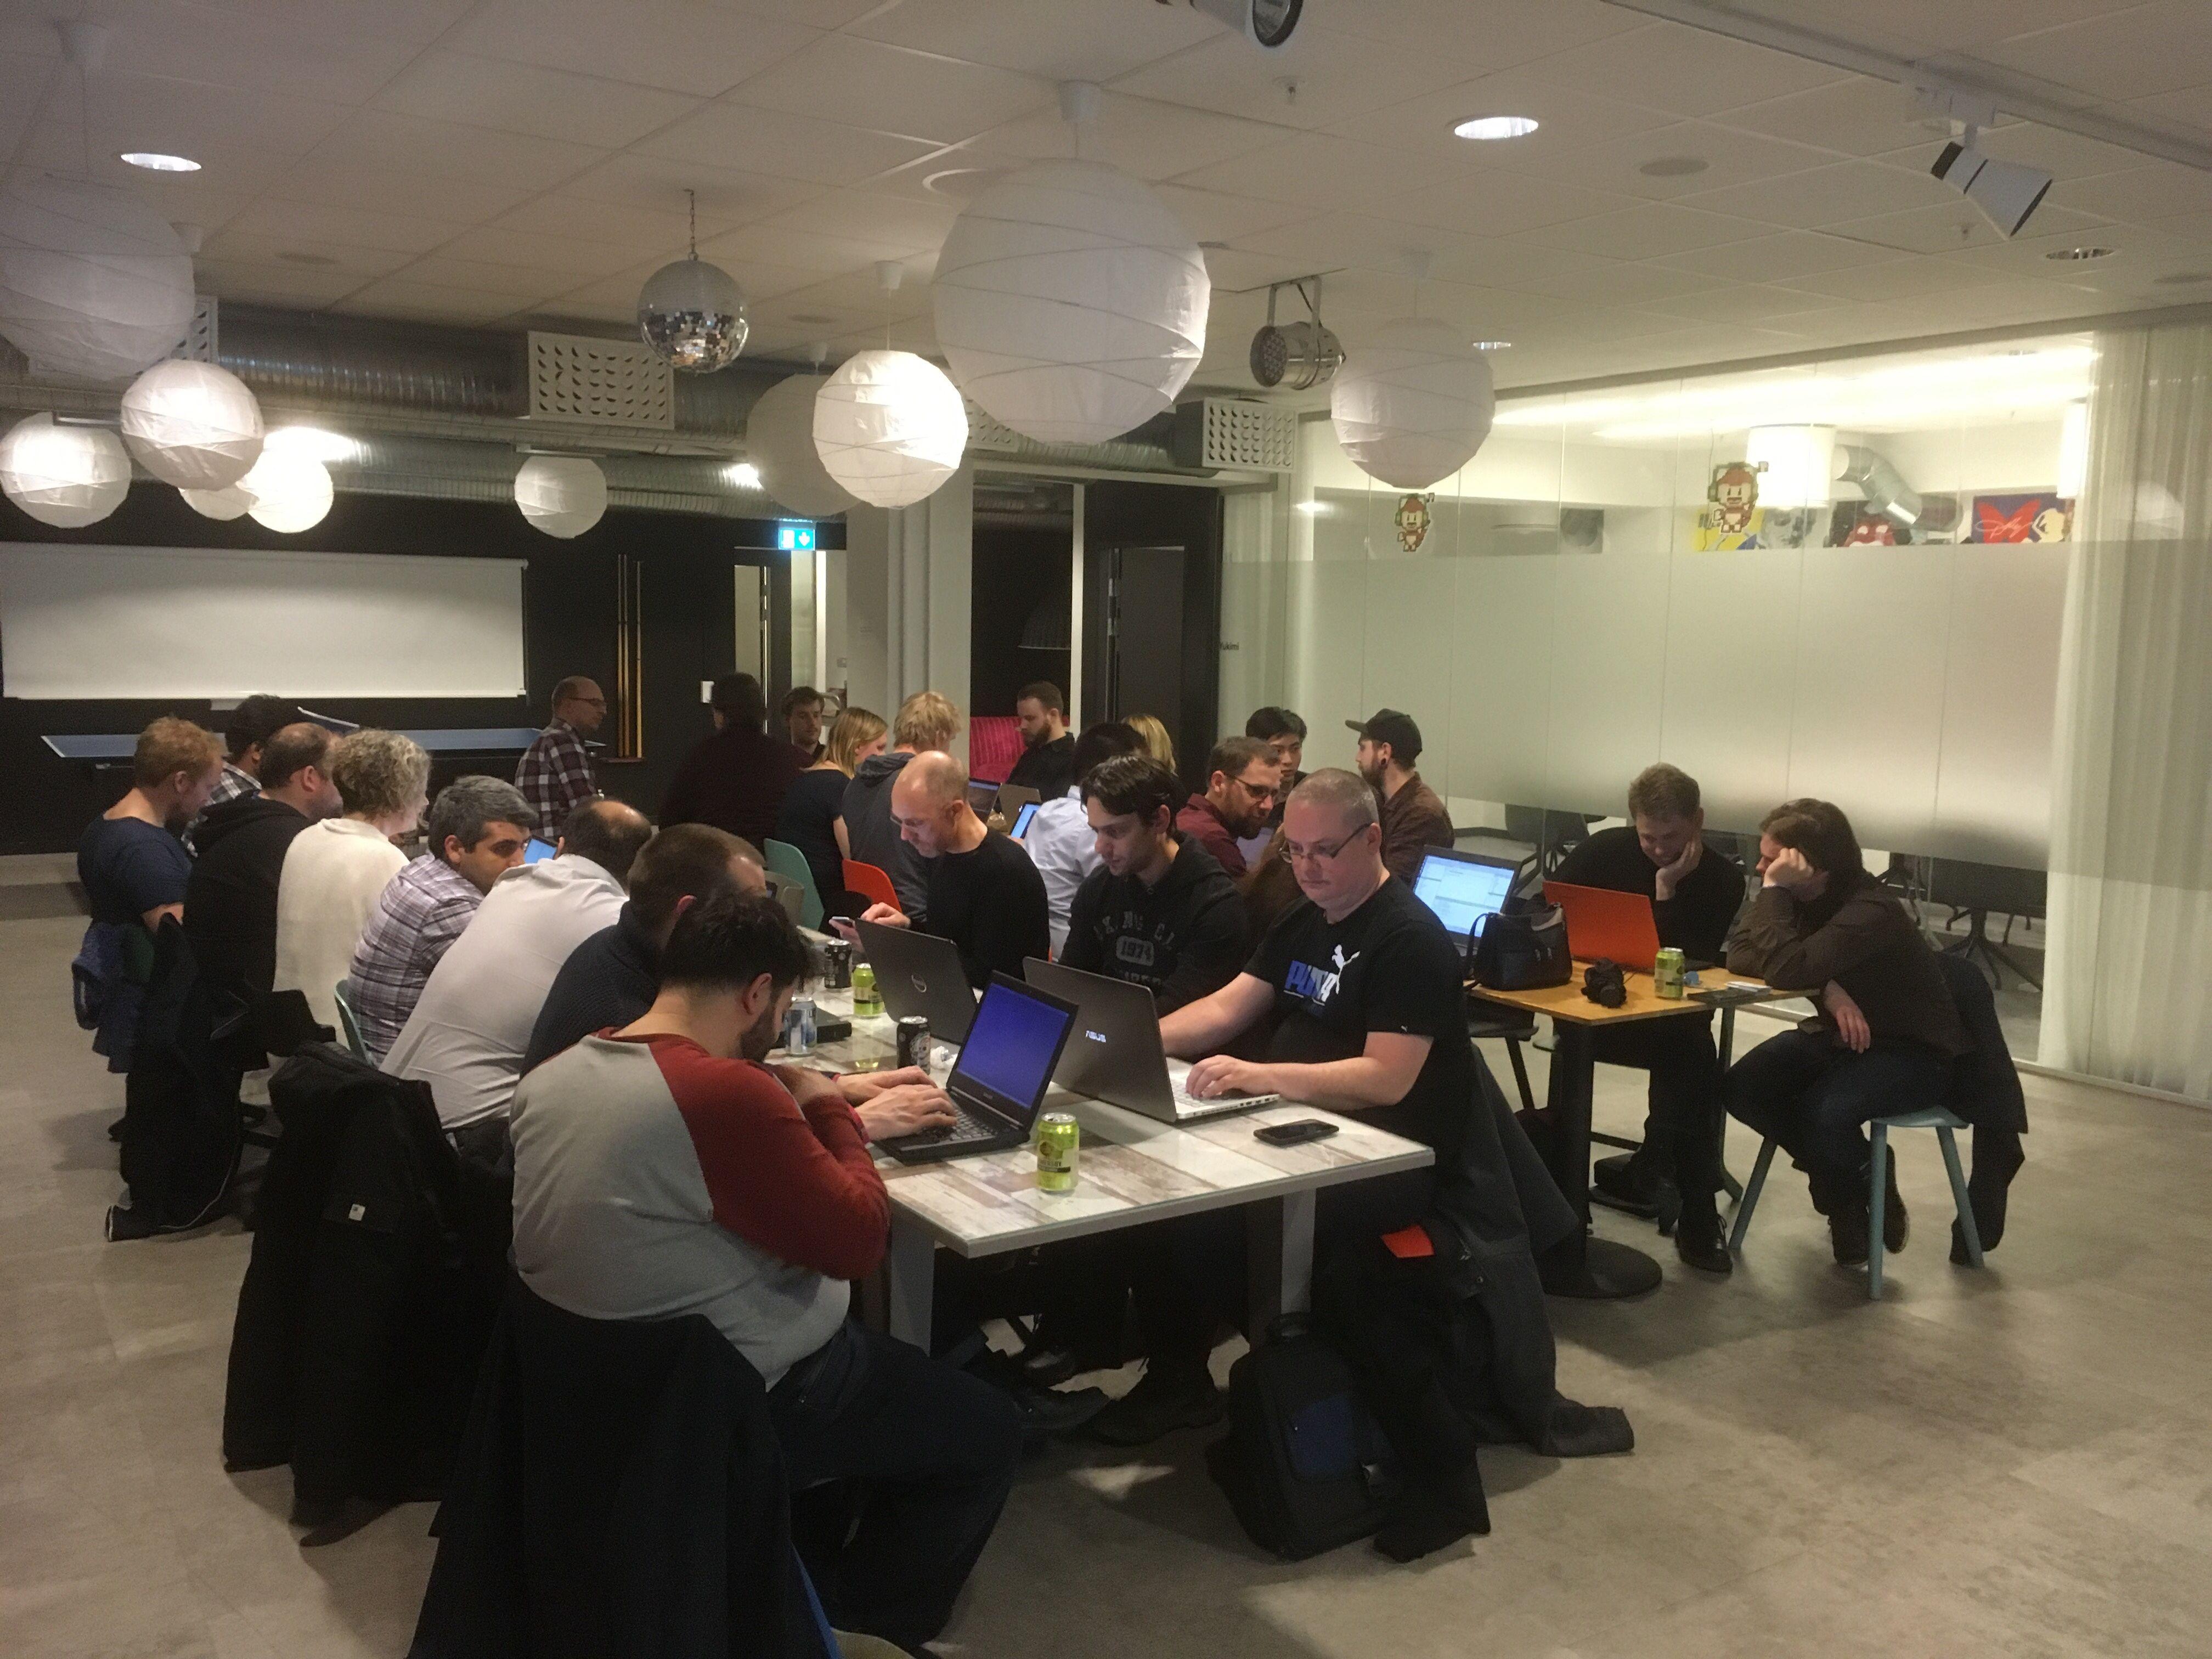 gbgcpp - Gothenburg C++ Meetup